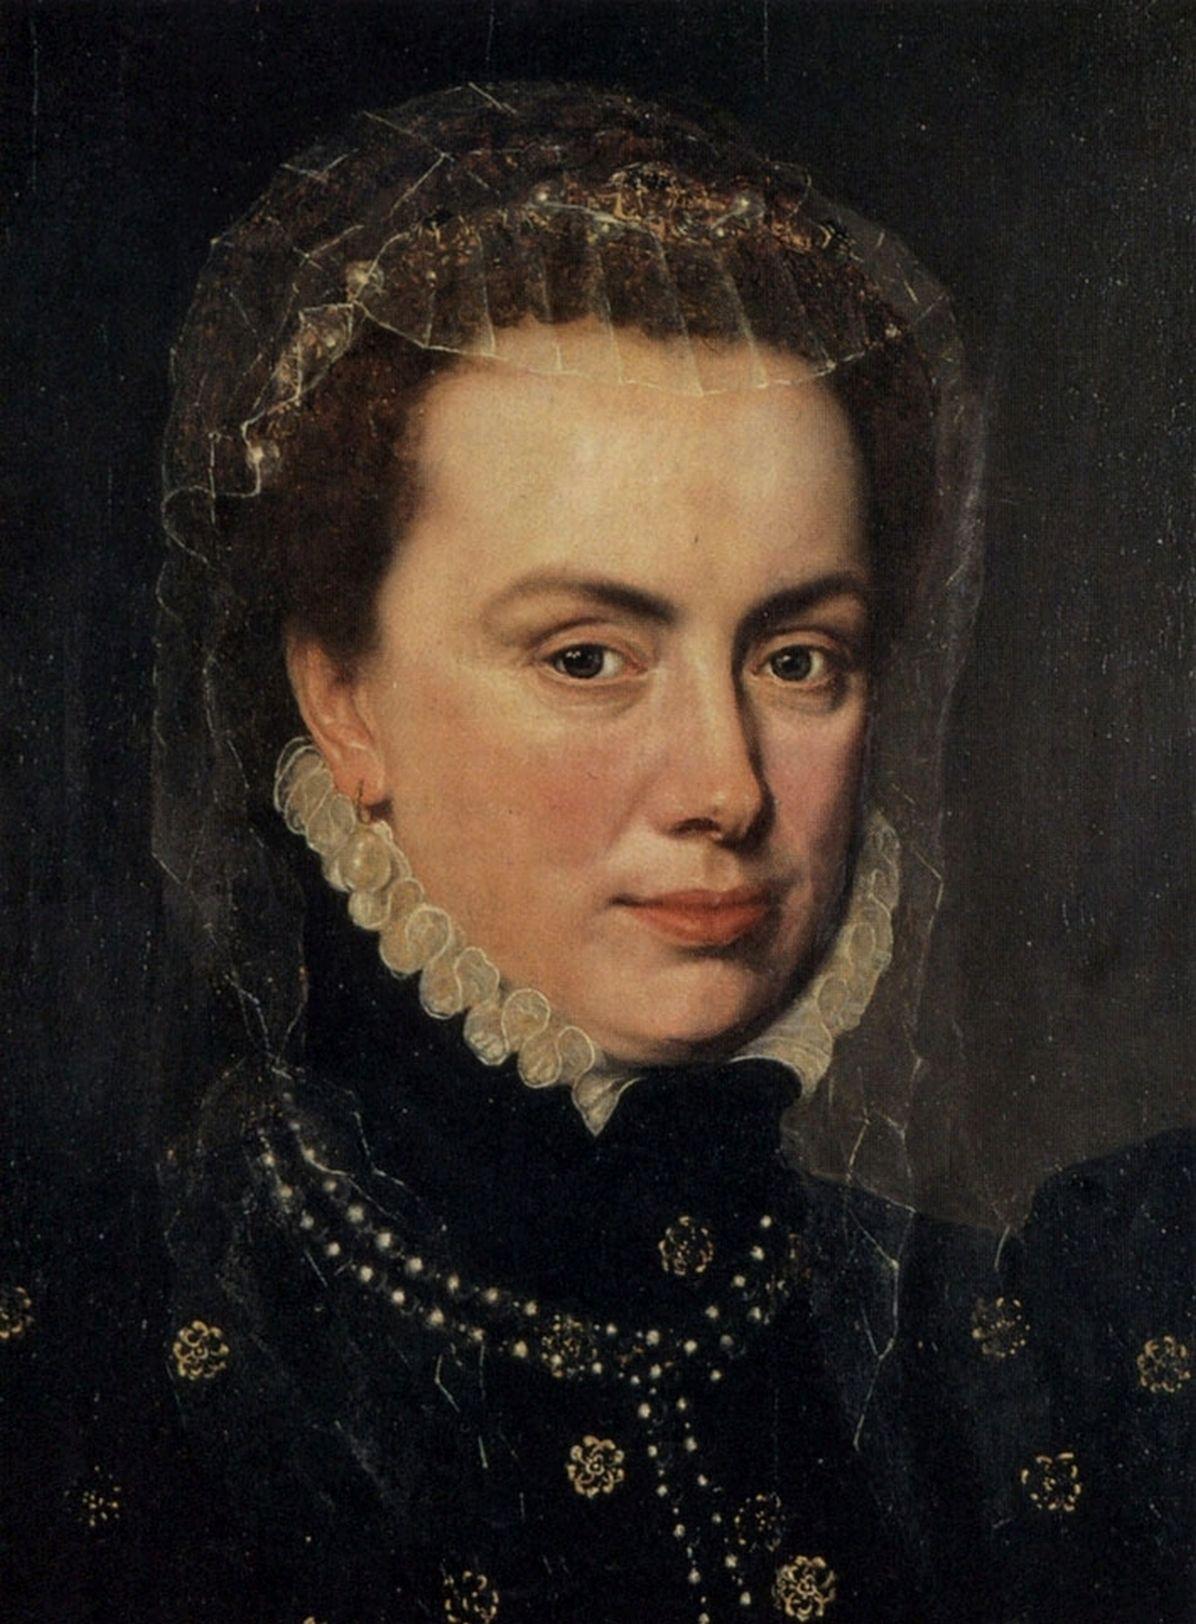 Portret van landvoogdes Margaretha van Parma. (Anthonis Mor, 1519-1575)